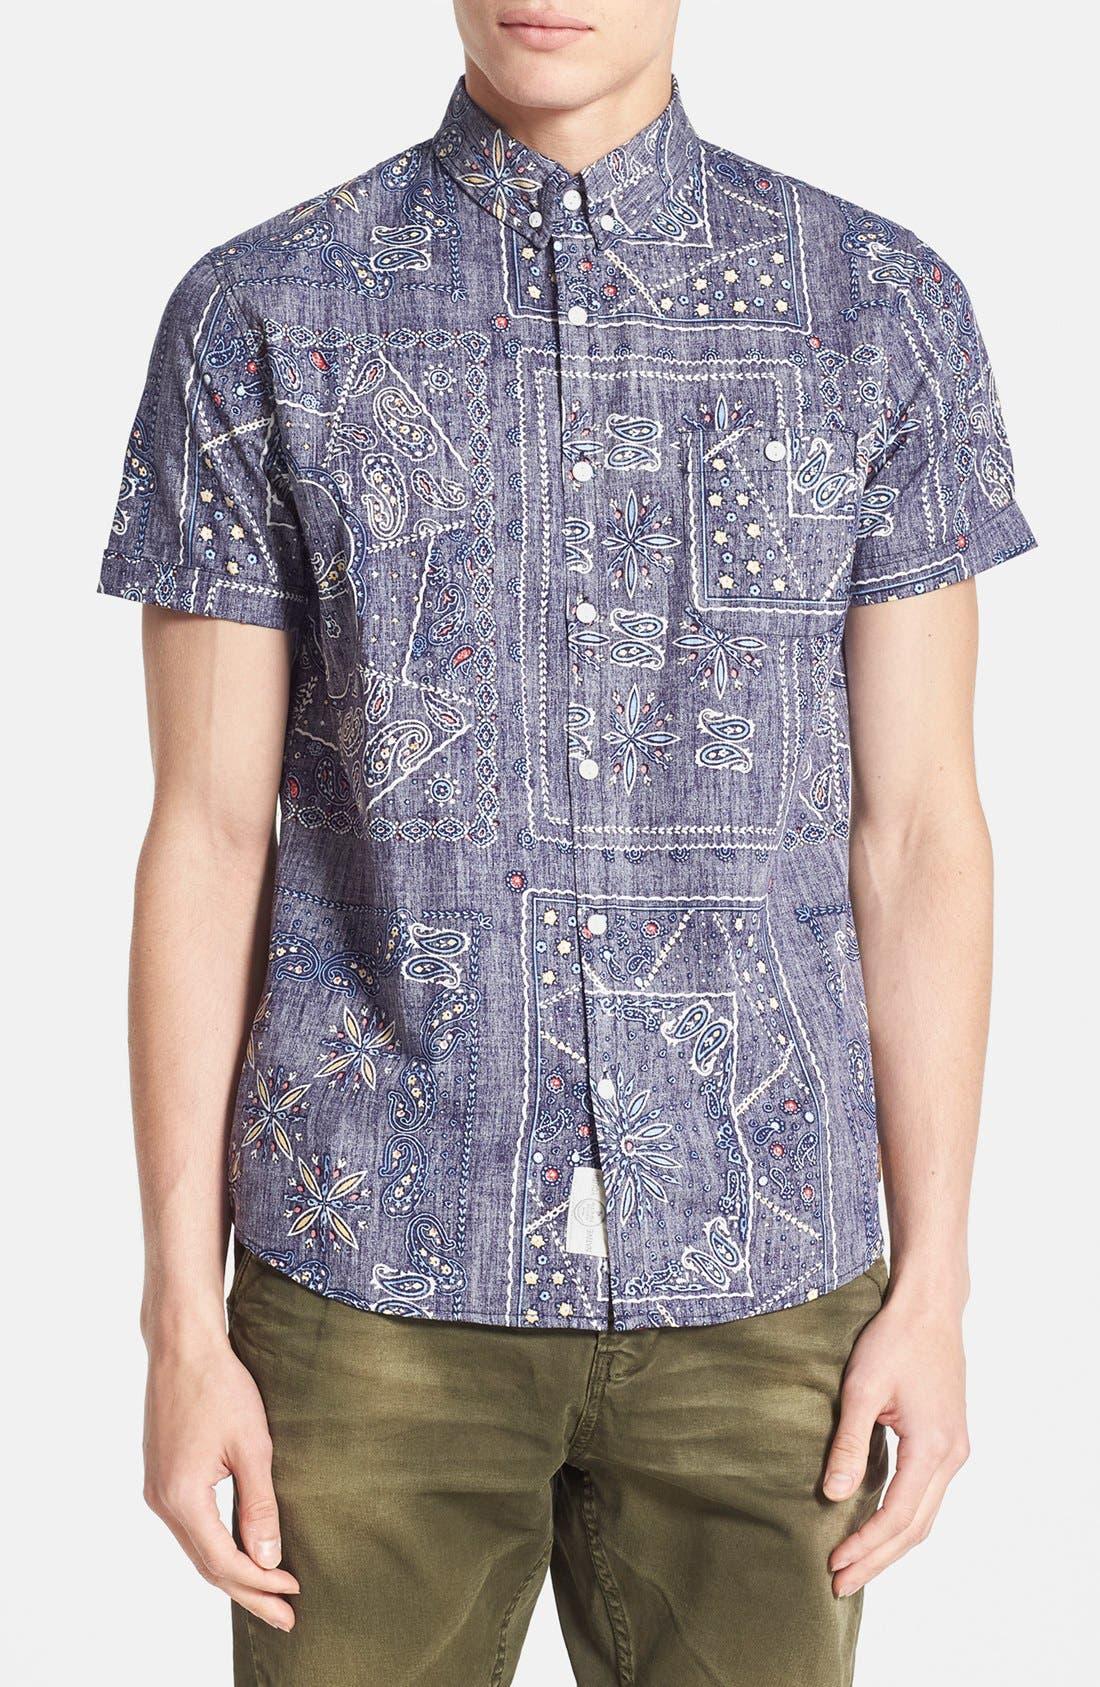 Alternate Image 1 Selected - Native Youth Gypsy Paisley Print Short Sleeve Chambray Shirt